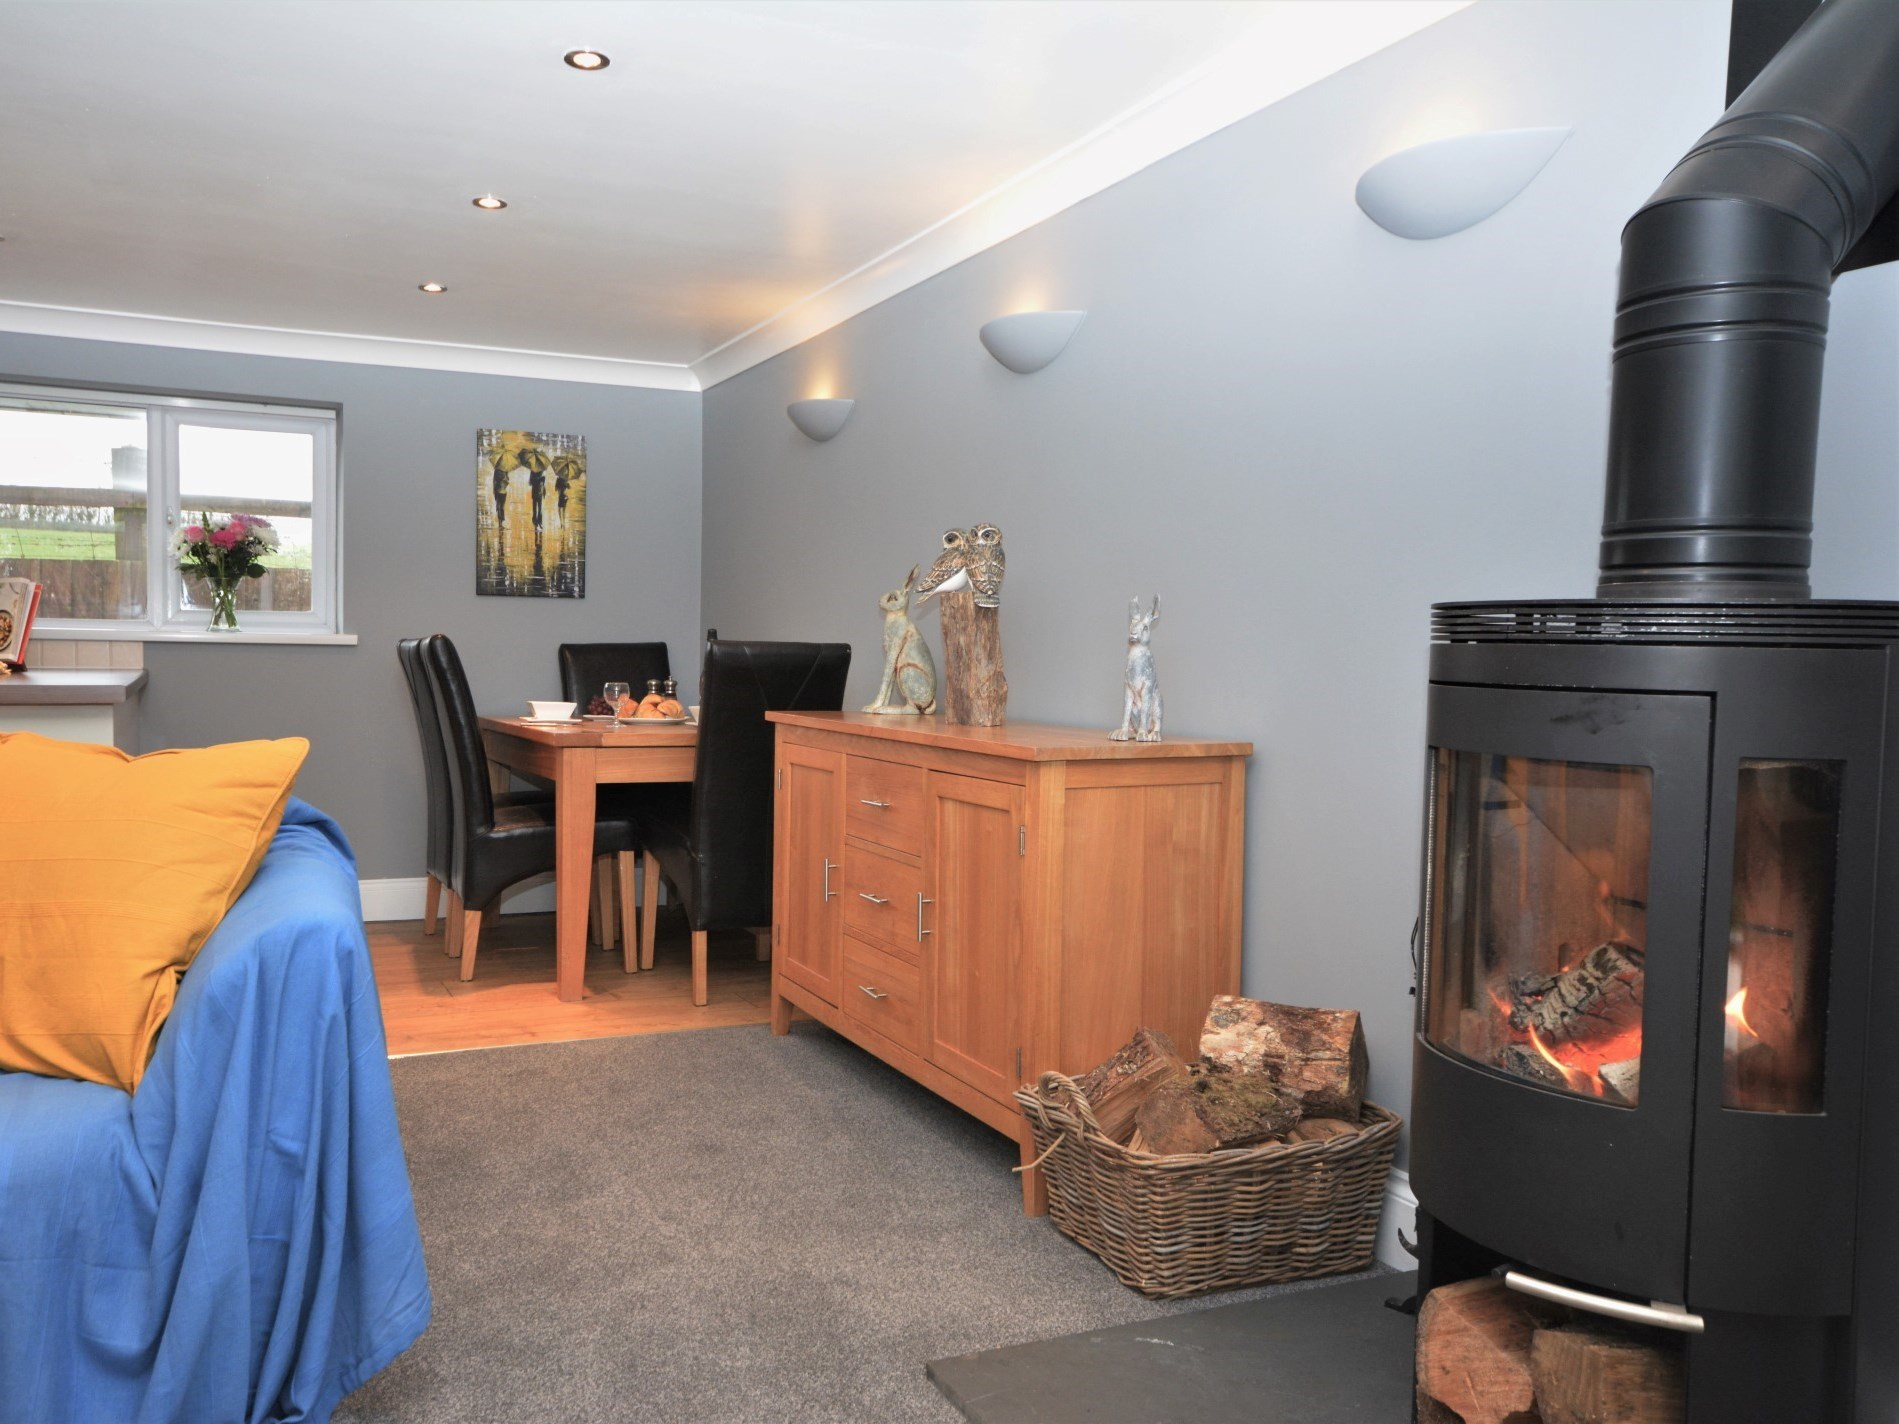 1 Bedroom Bungalow in South Devon, Devon